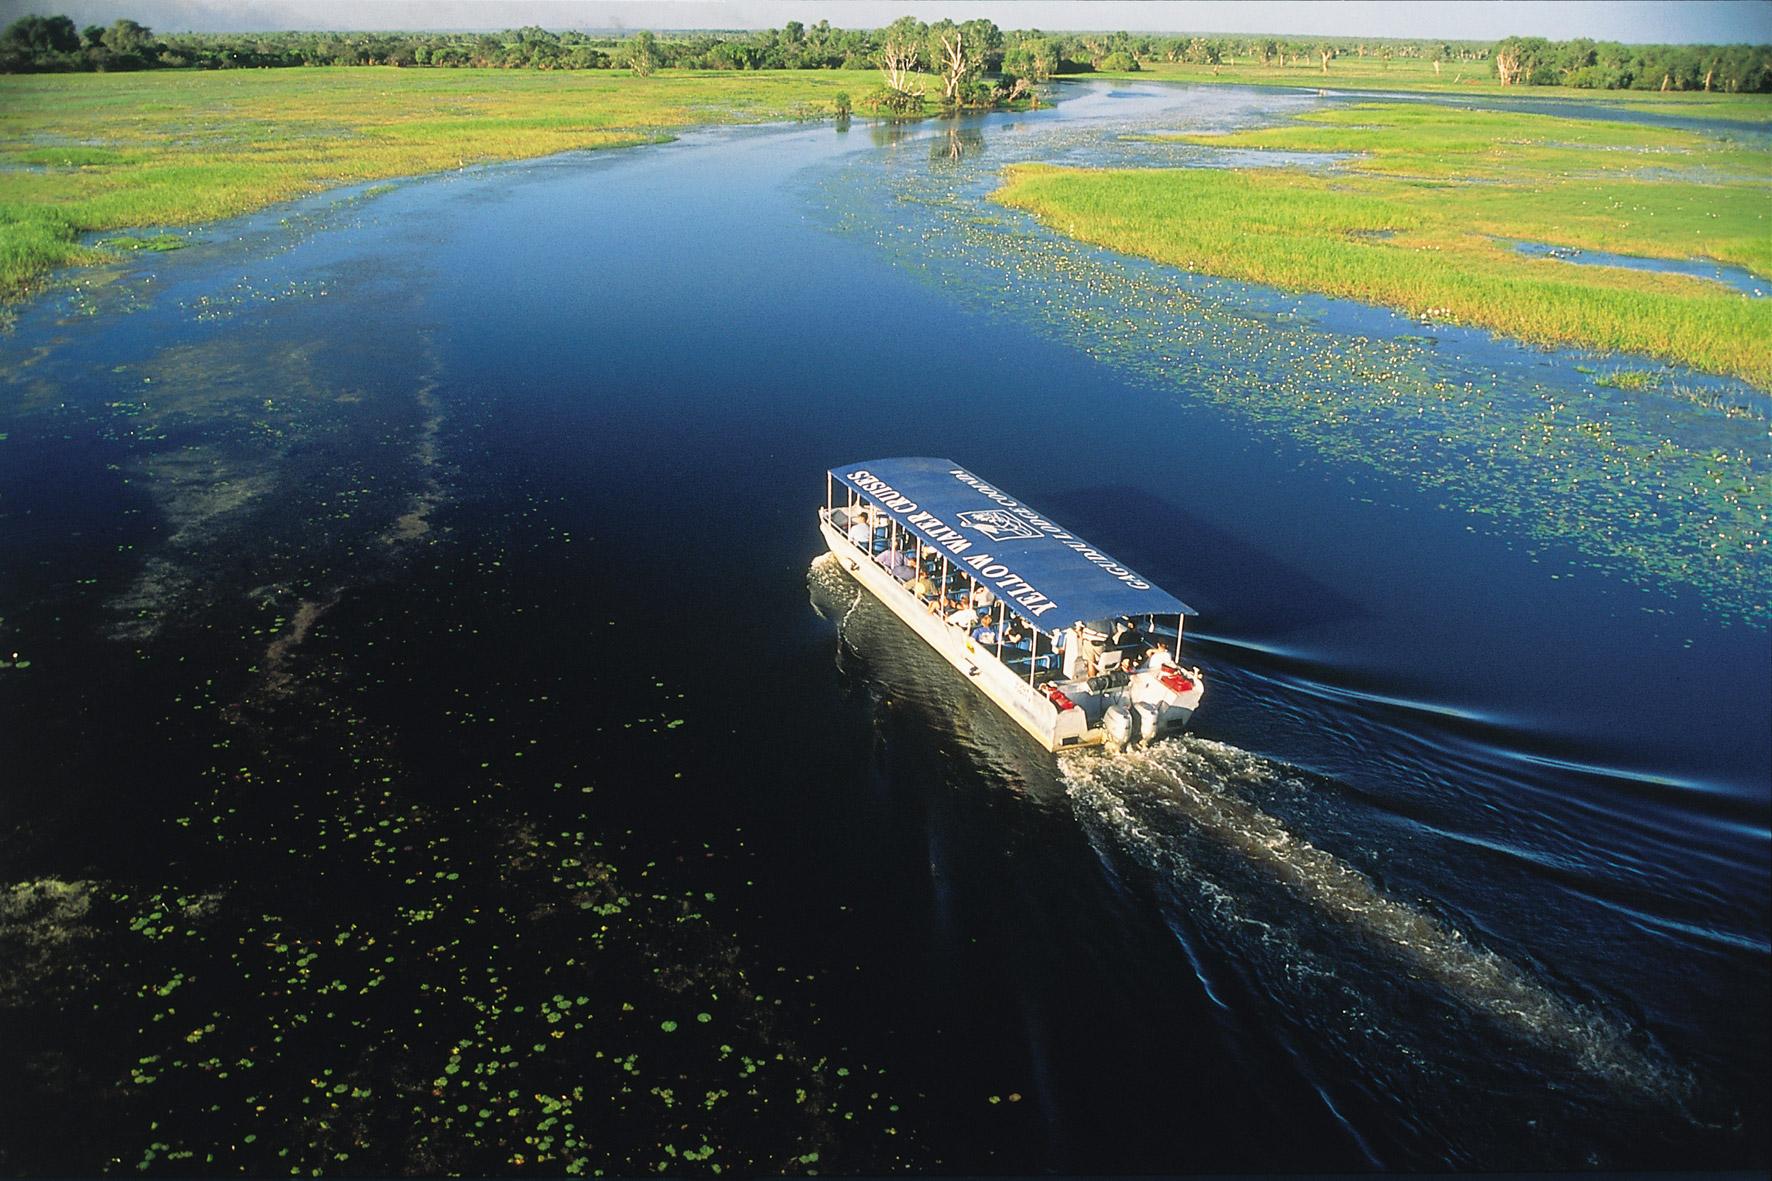 Kakadu & East Alligator River | Yellow Water Cruise, Kakadu National Park, Northern Territory